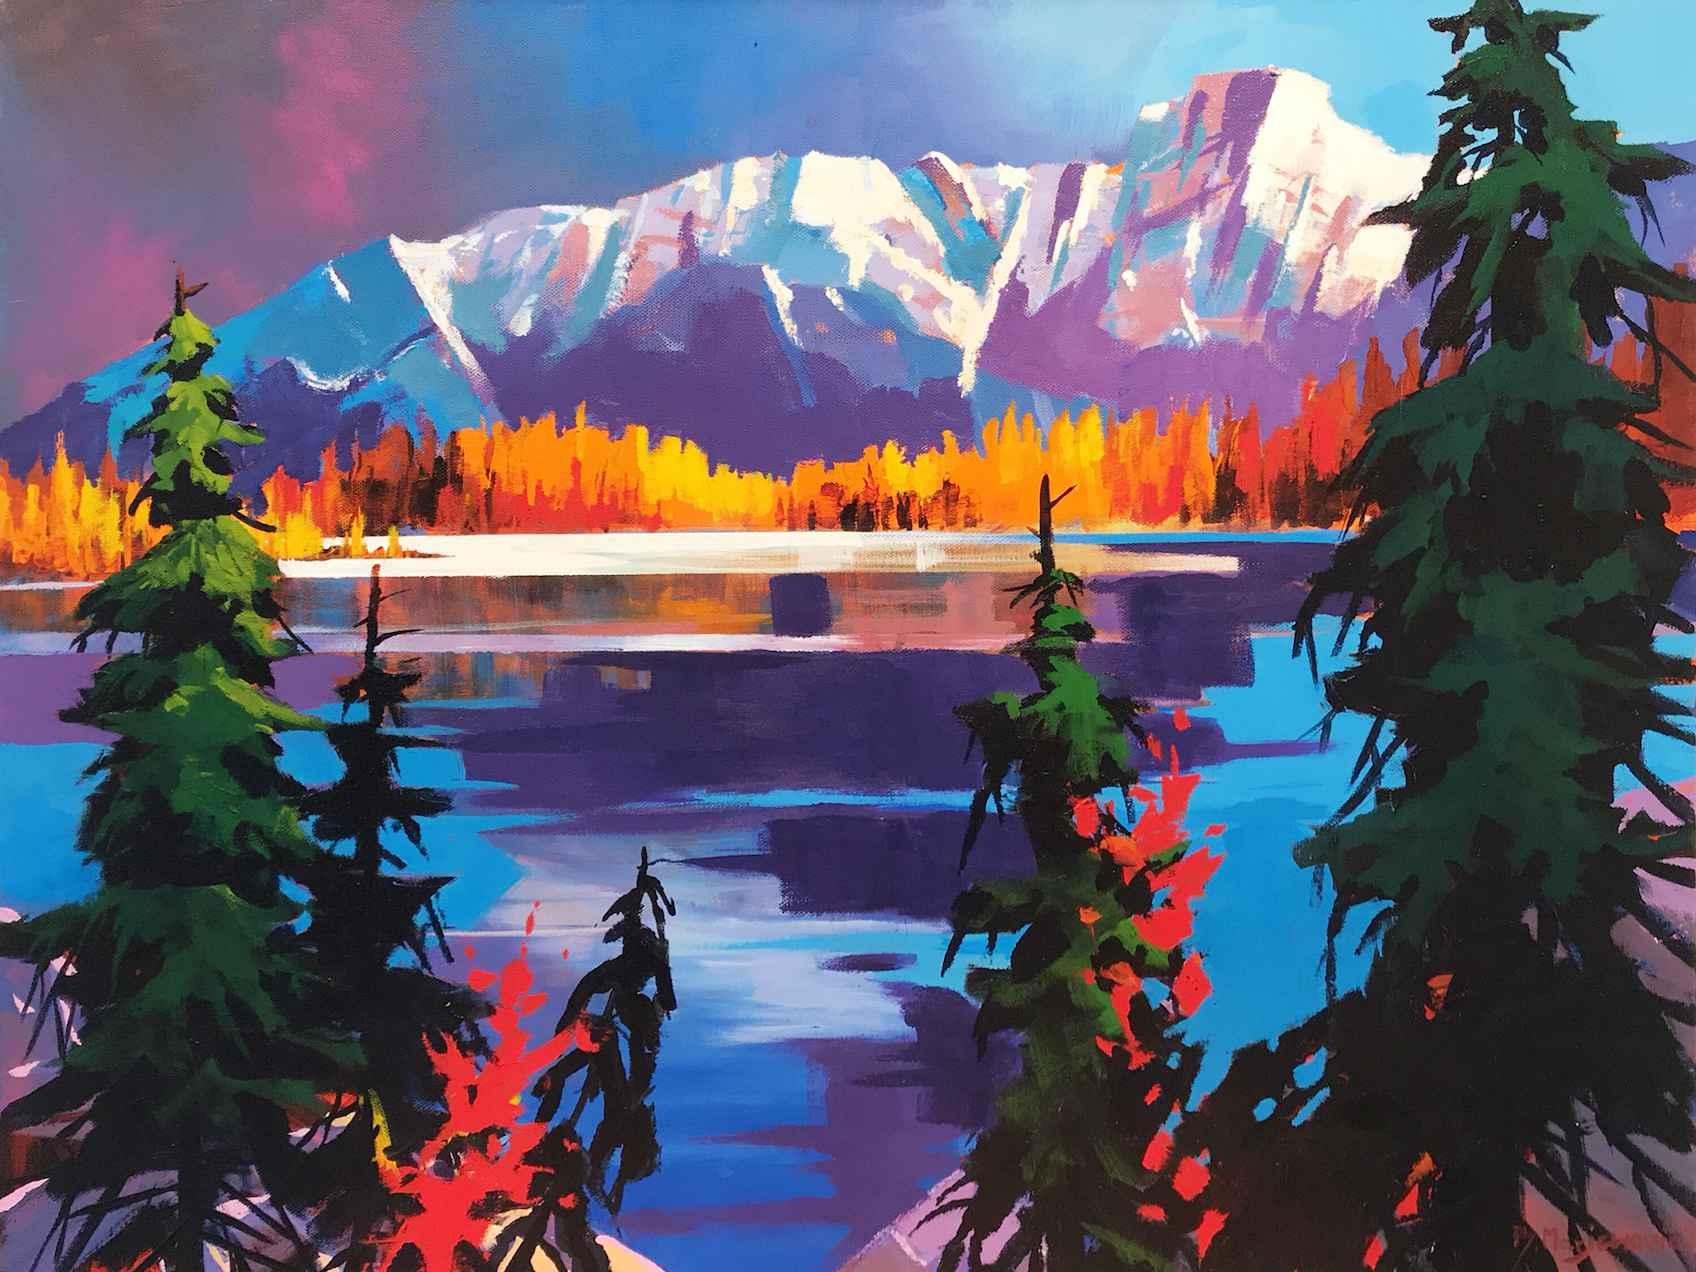 Lake O'Hara Evening S... by  Branko Marjanovic - Masterpiece Online